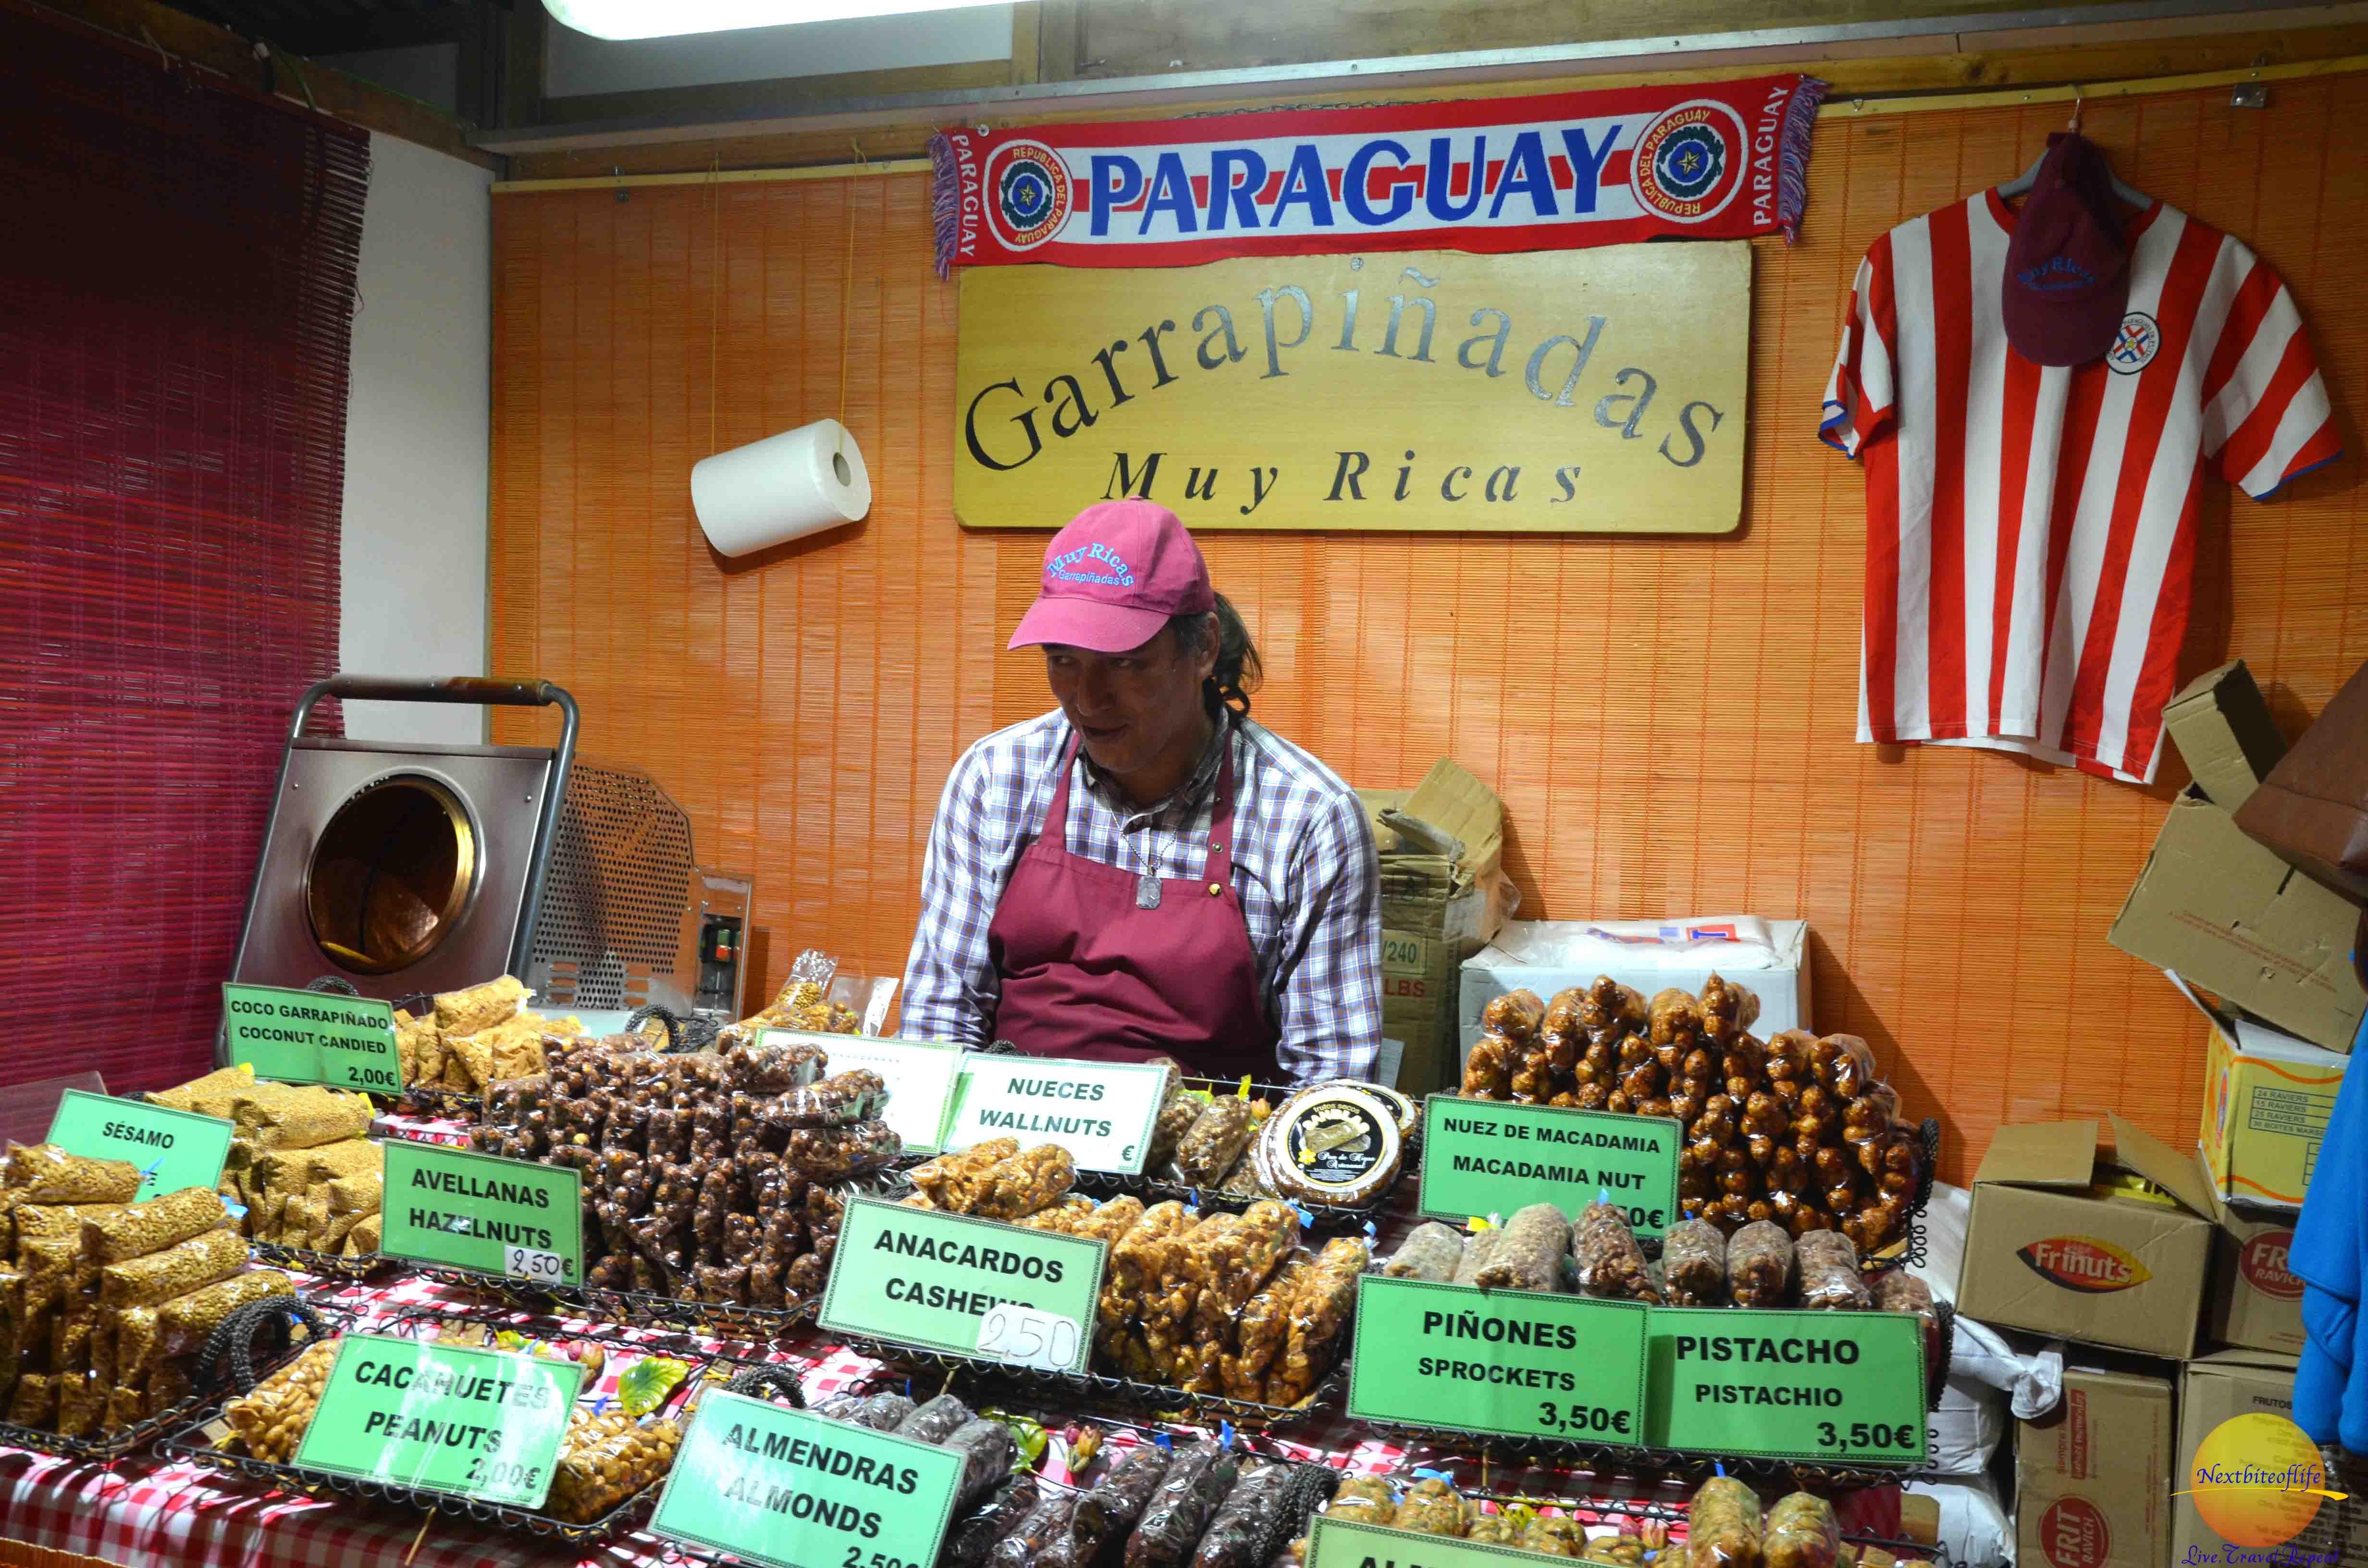 paraguay nnuts display